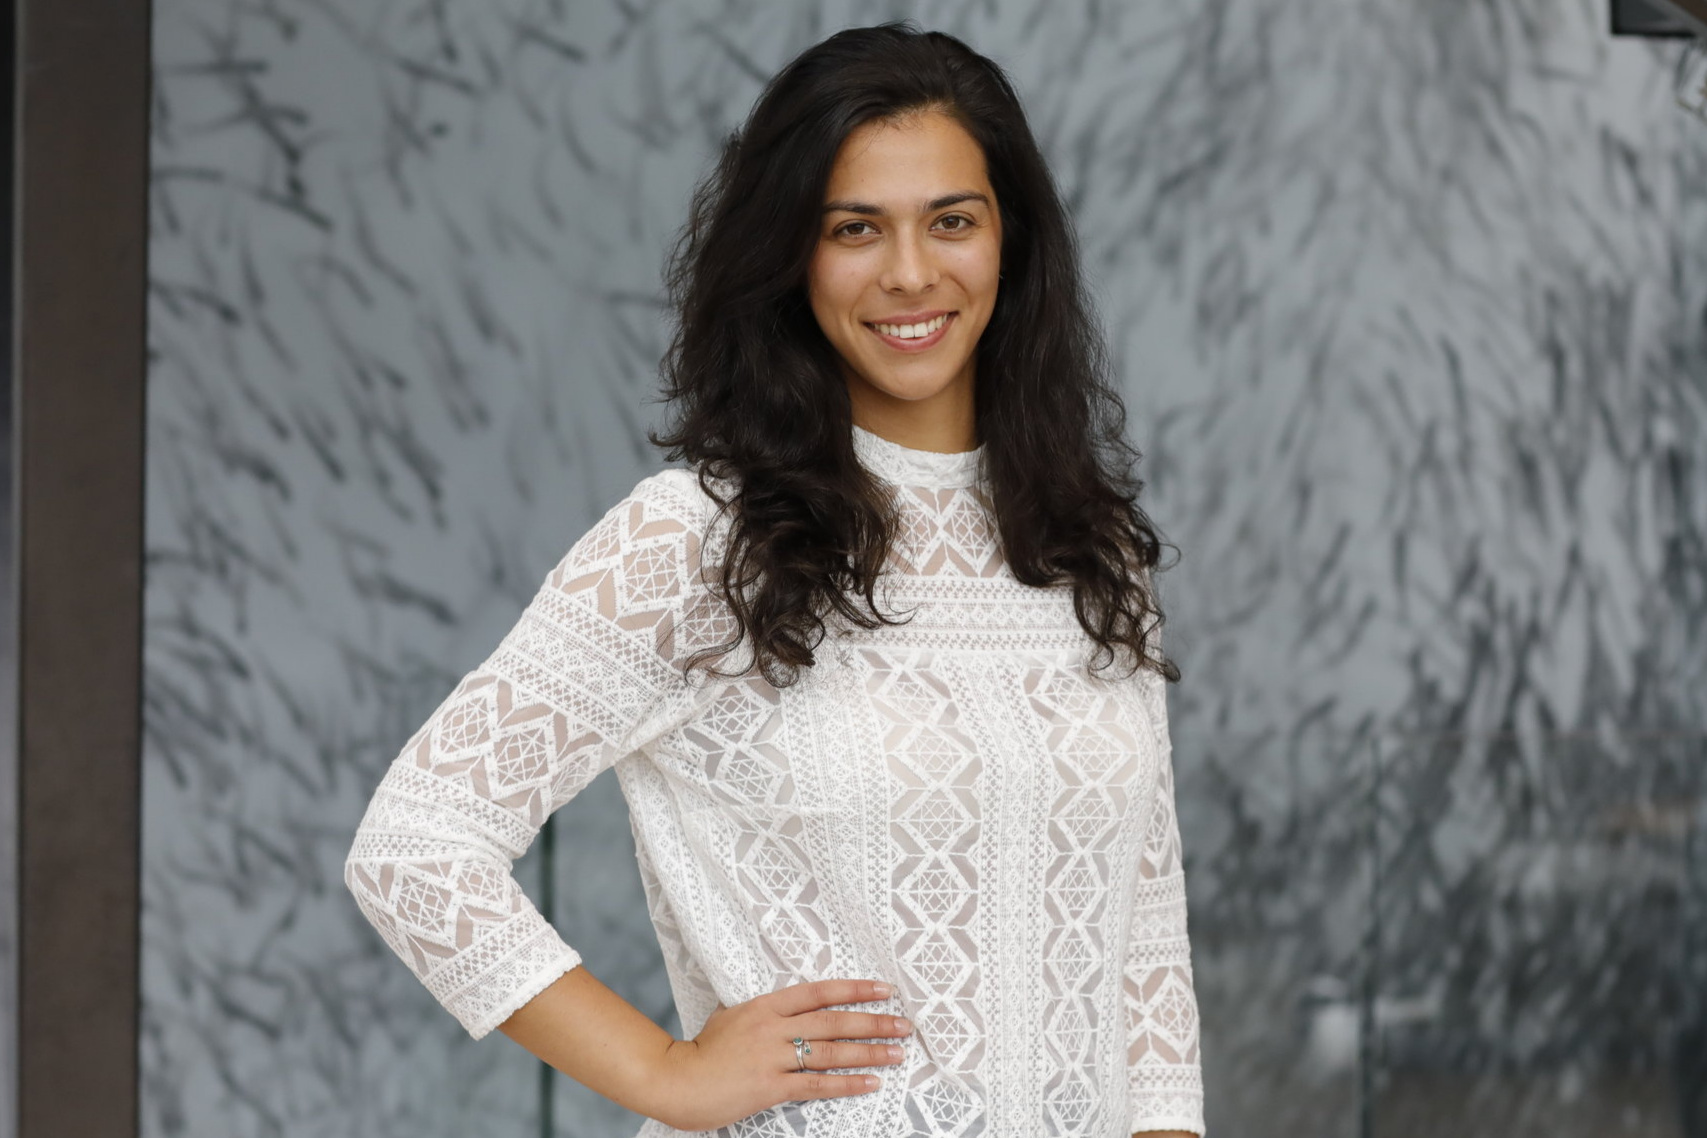 Camila Cimadamore - PhD Biological Science